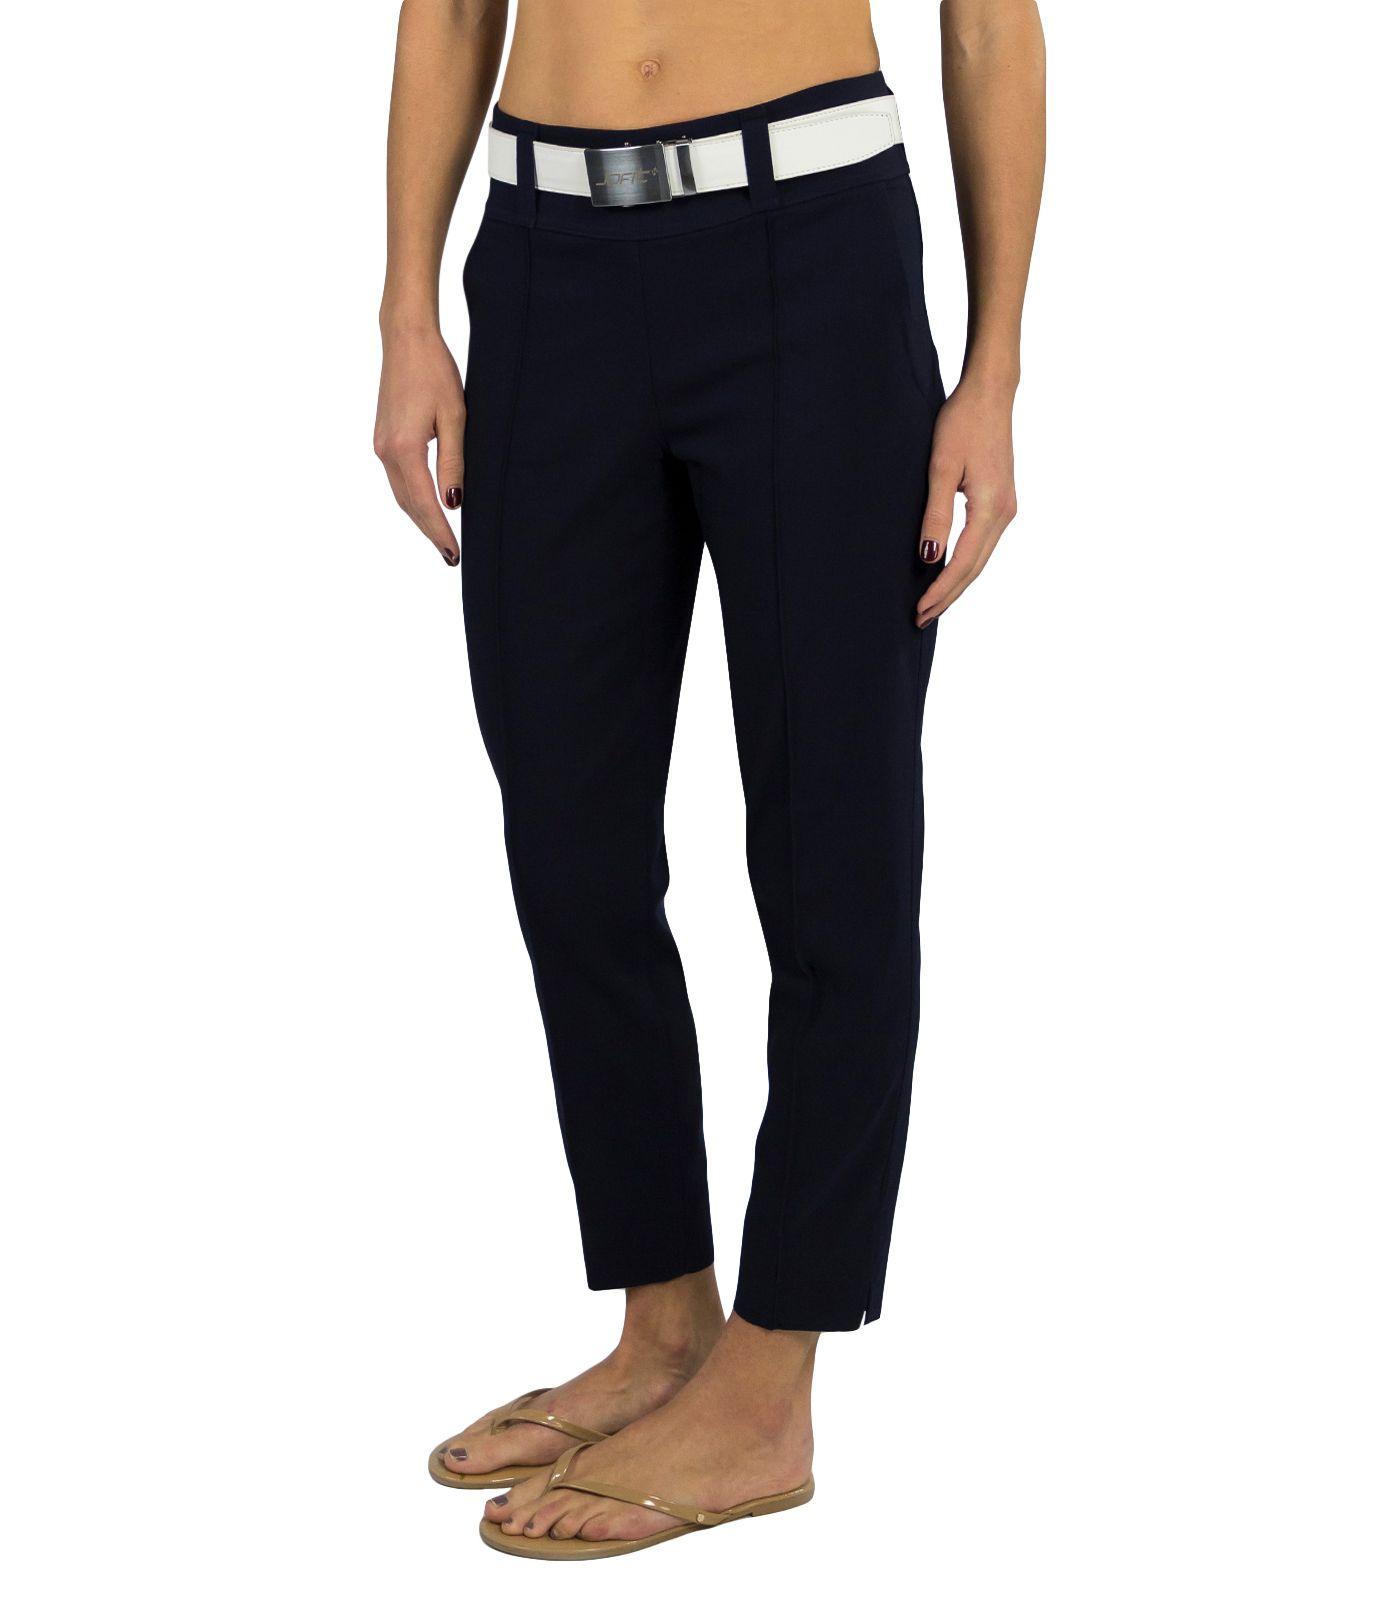 Jofit Women's Slimmer Cropped Pants